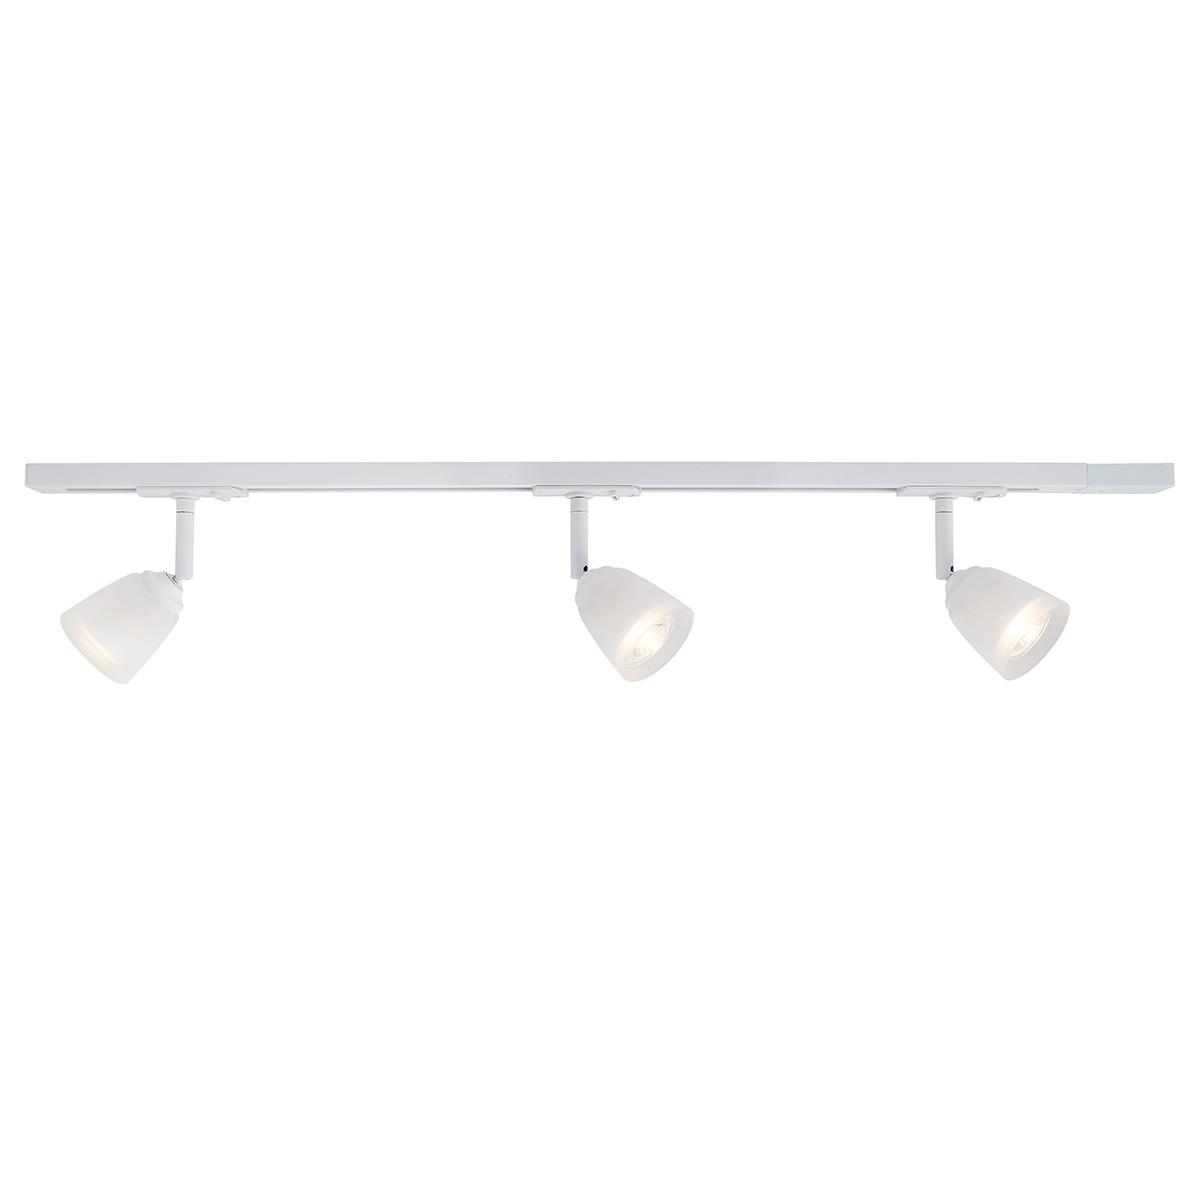 Image of   Halo Design loftlampe med spot - HaloTrack skinne-kit - Value - Hvid